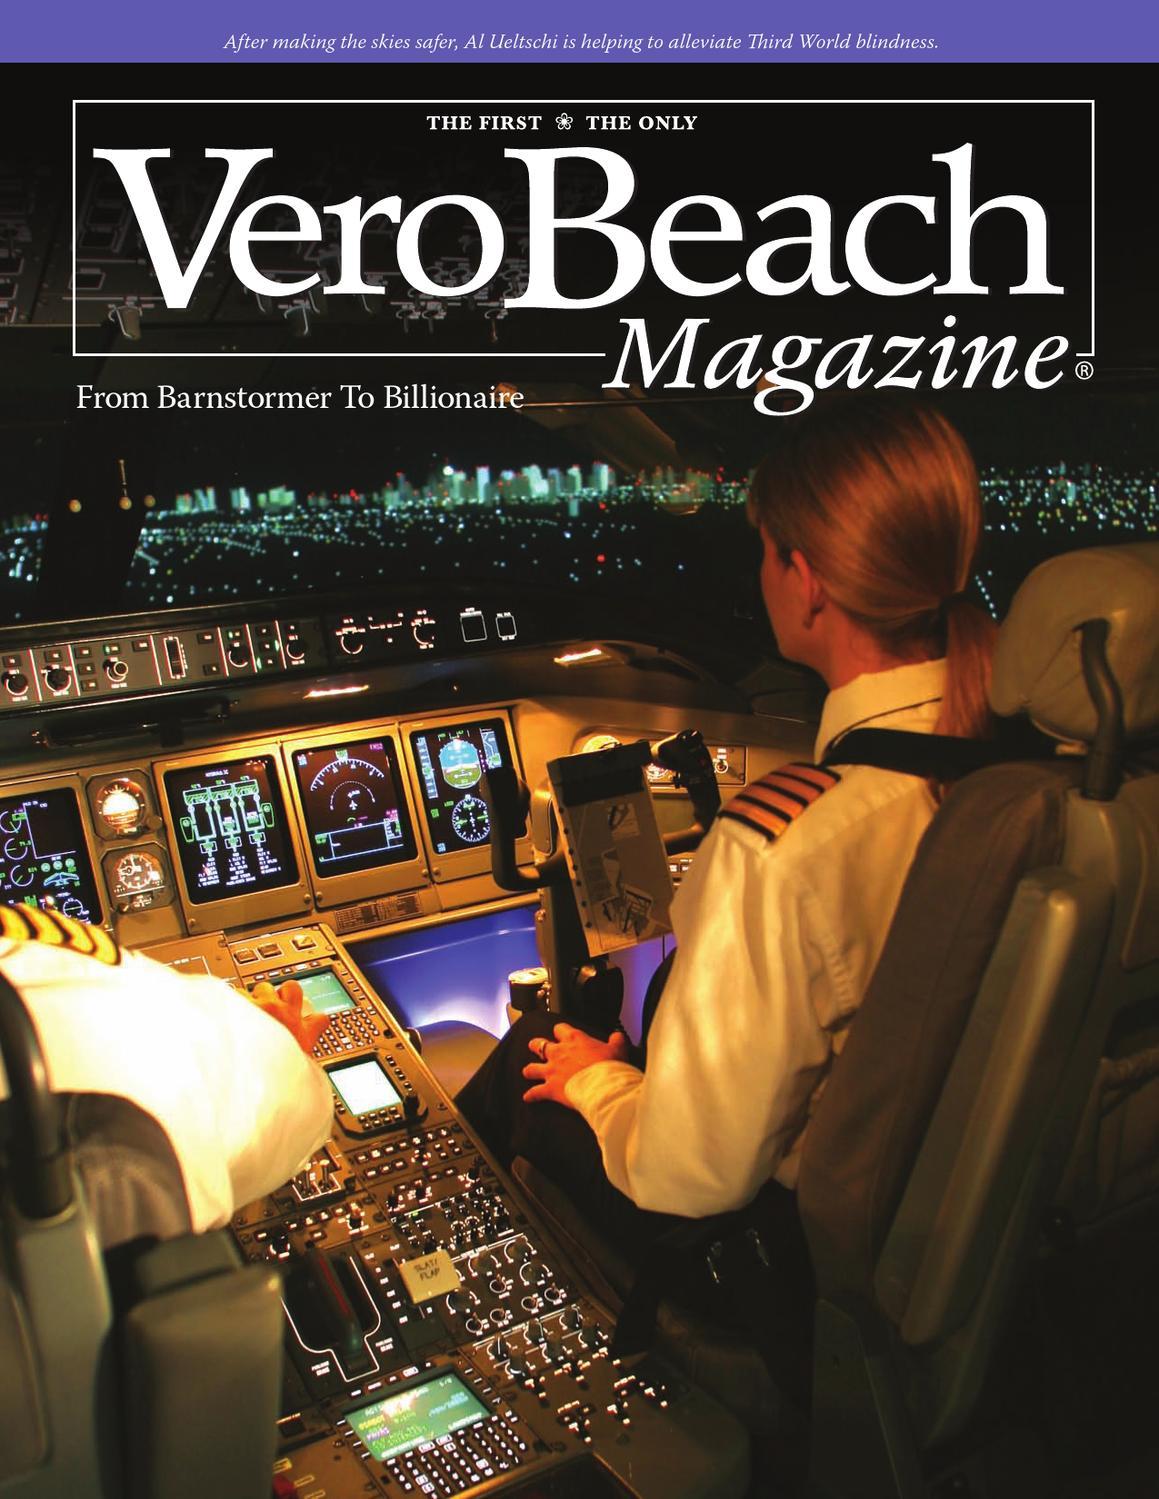 Al Ueltschi: From Barnstormer To Billionaire by Vero Beach